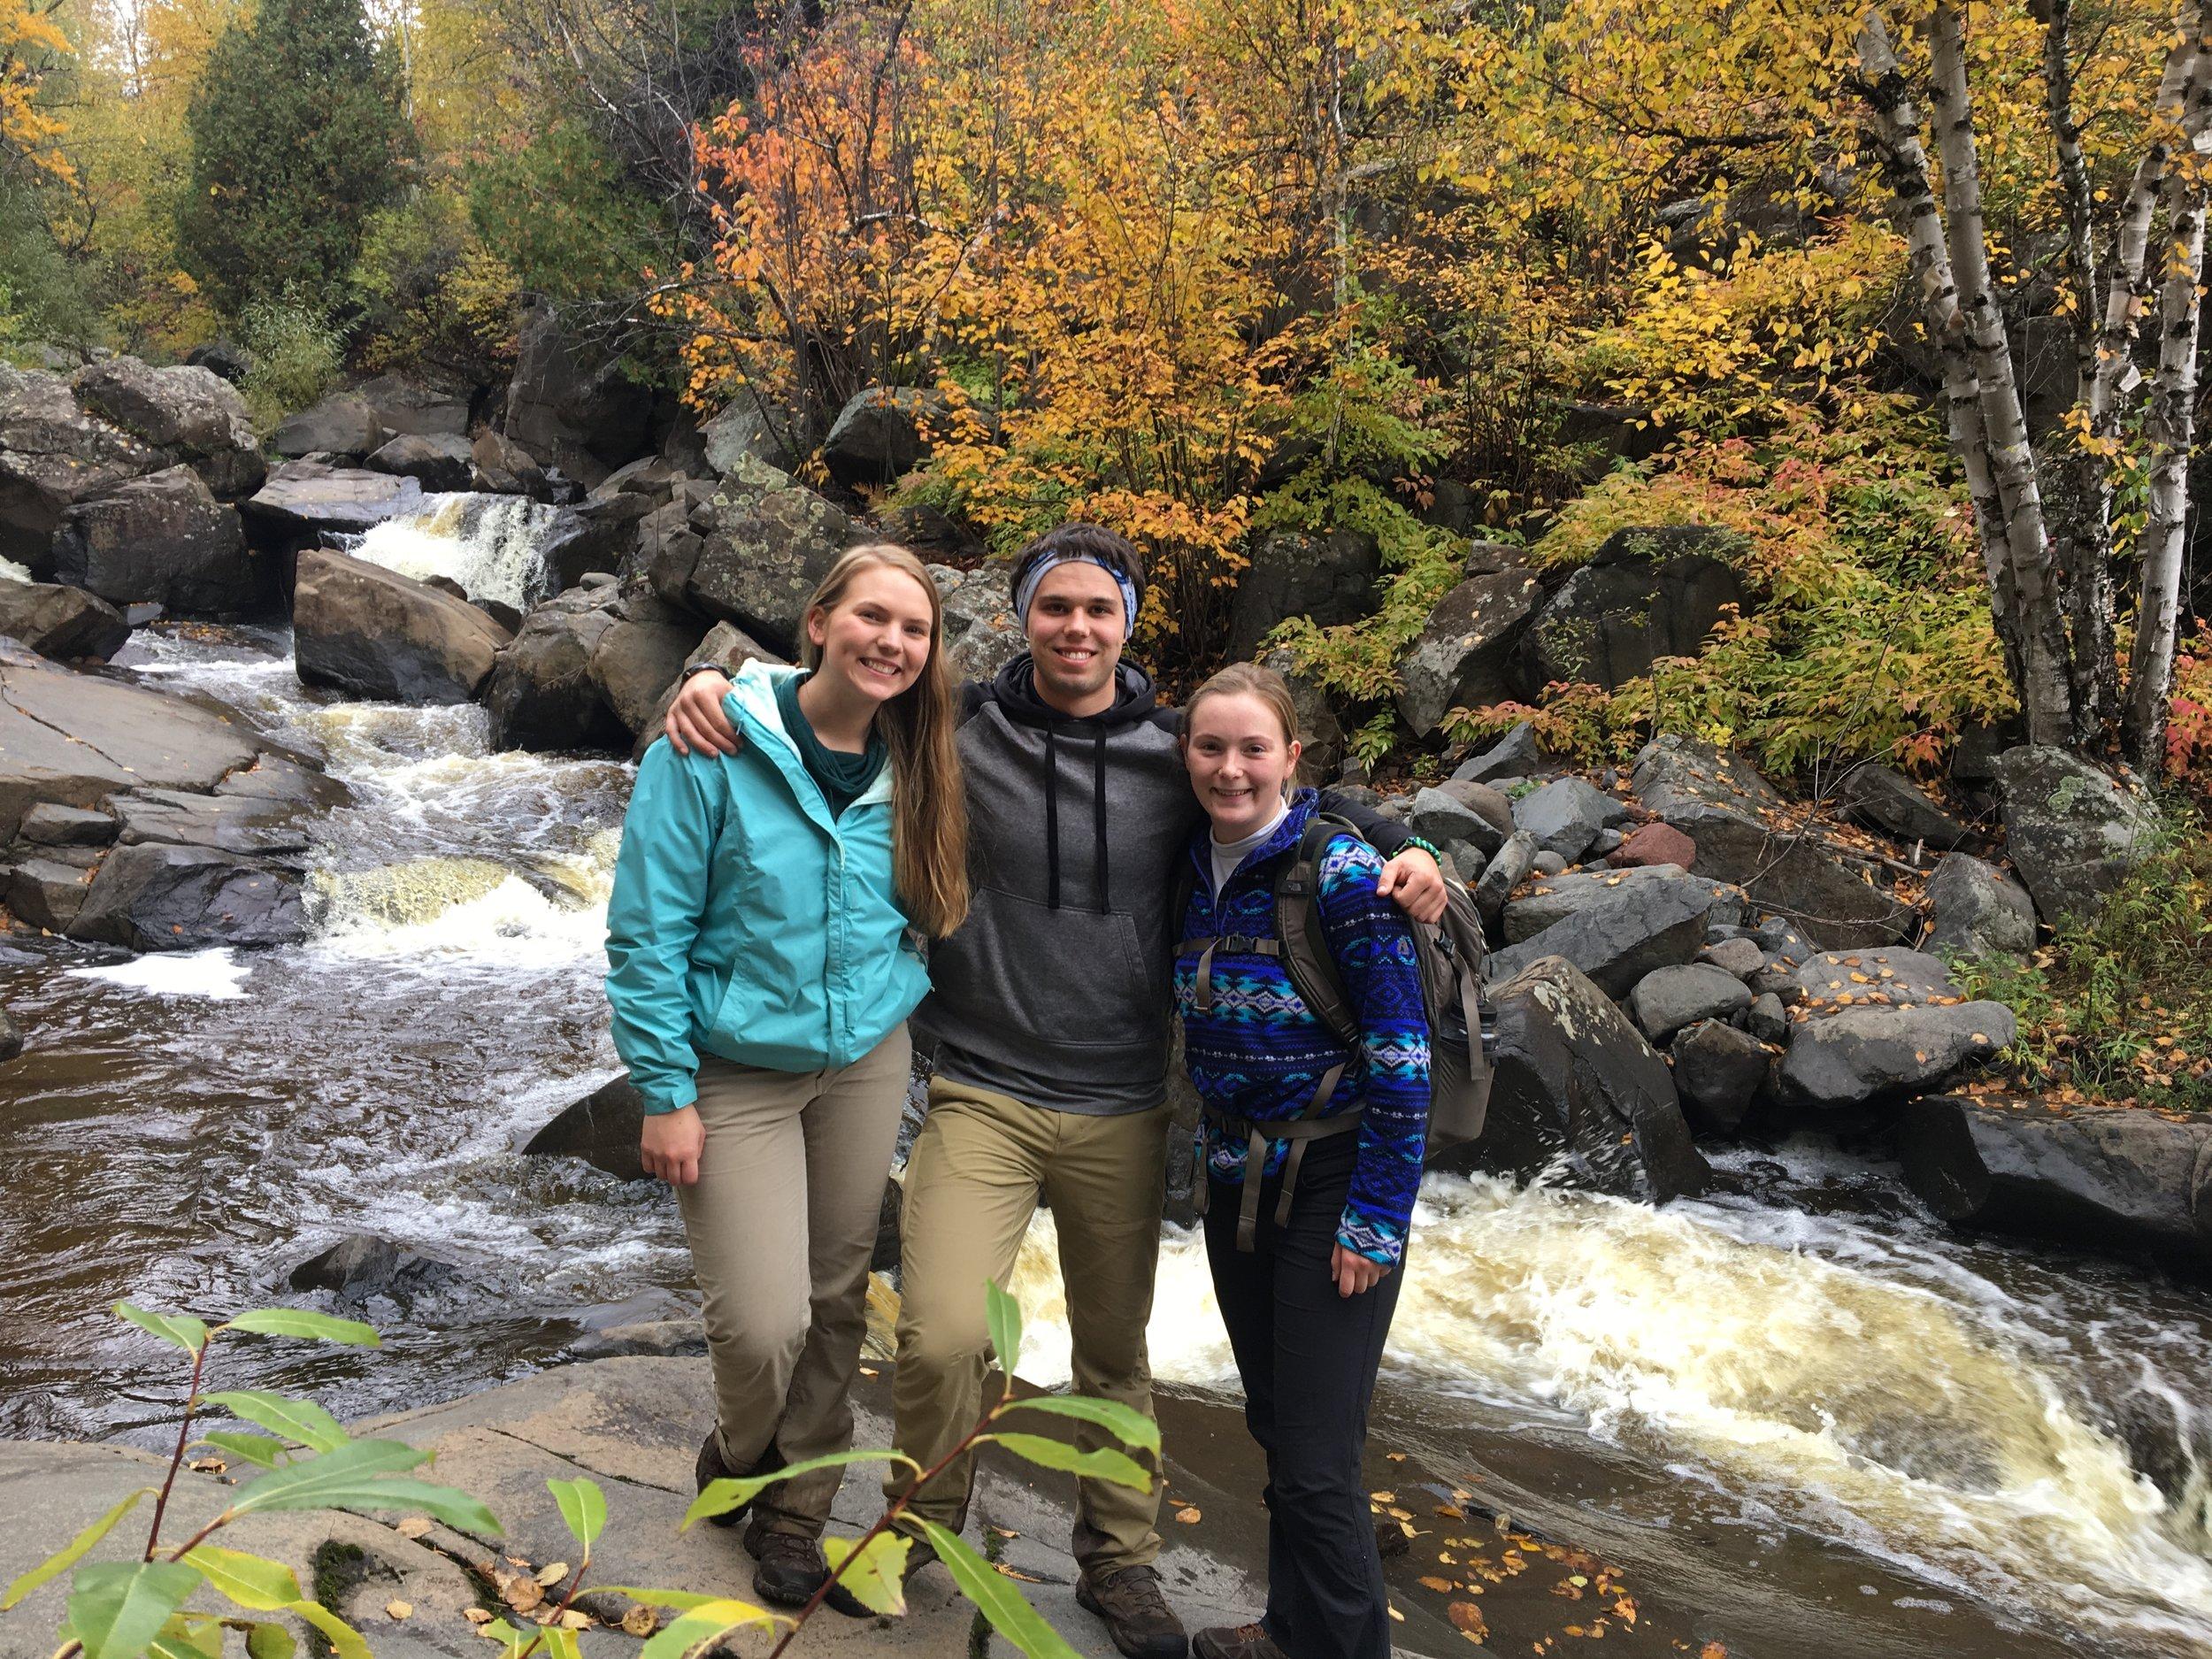 Leaders Juliana Olson and Sam Nesheim, with fellow hiker Abbey Graner. Photo courtesy of Juliana Olson